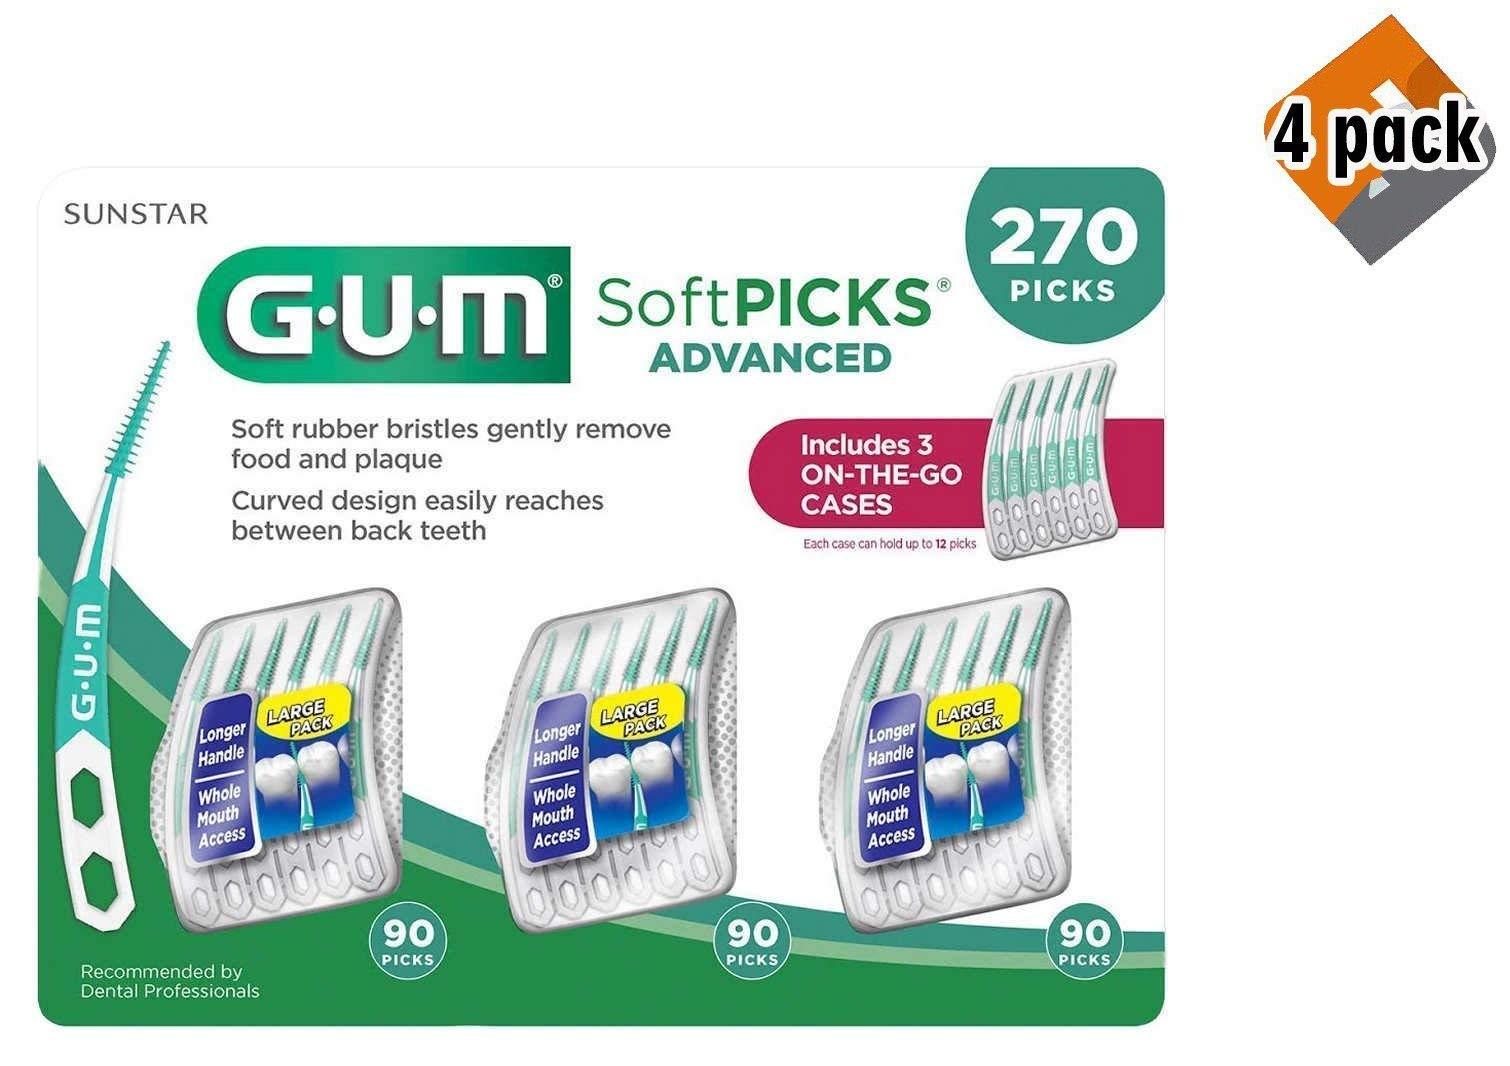 GUM Soft-Picks Advanced Dental Picks, 270 Count - 4 Pack